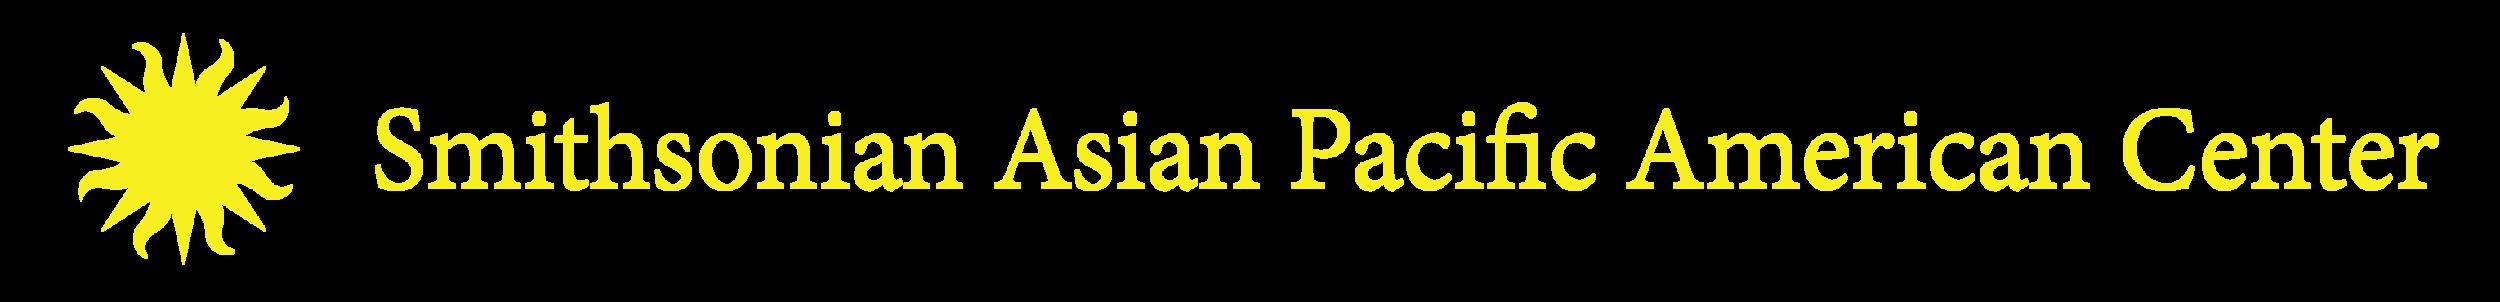 SmithsonianAPA-Logo-Yellow.png